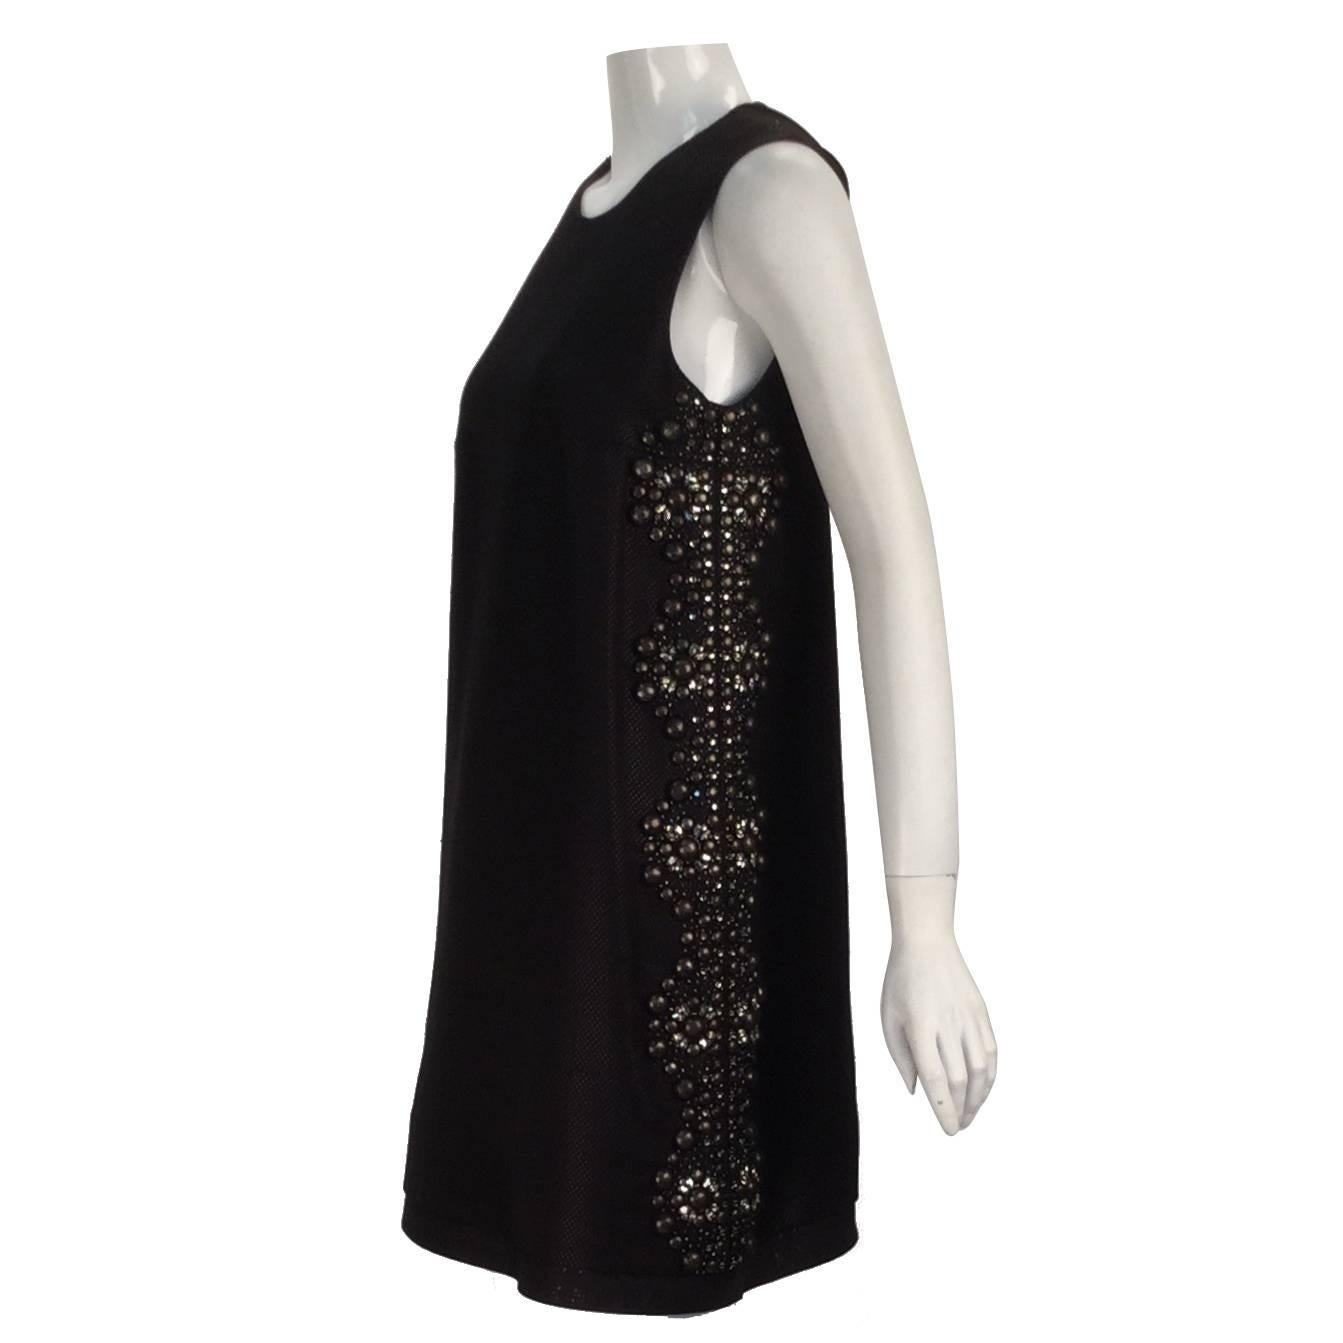 21st Century Black Studded Gucci Dress